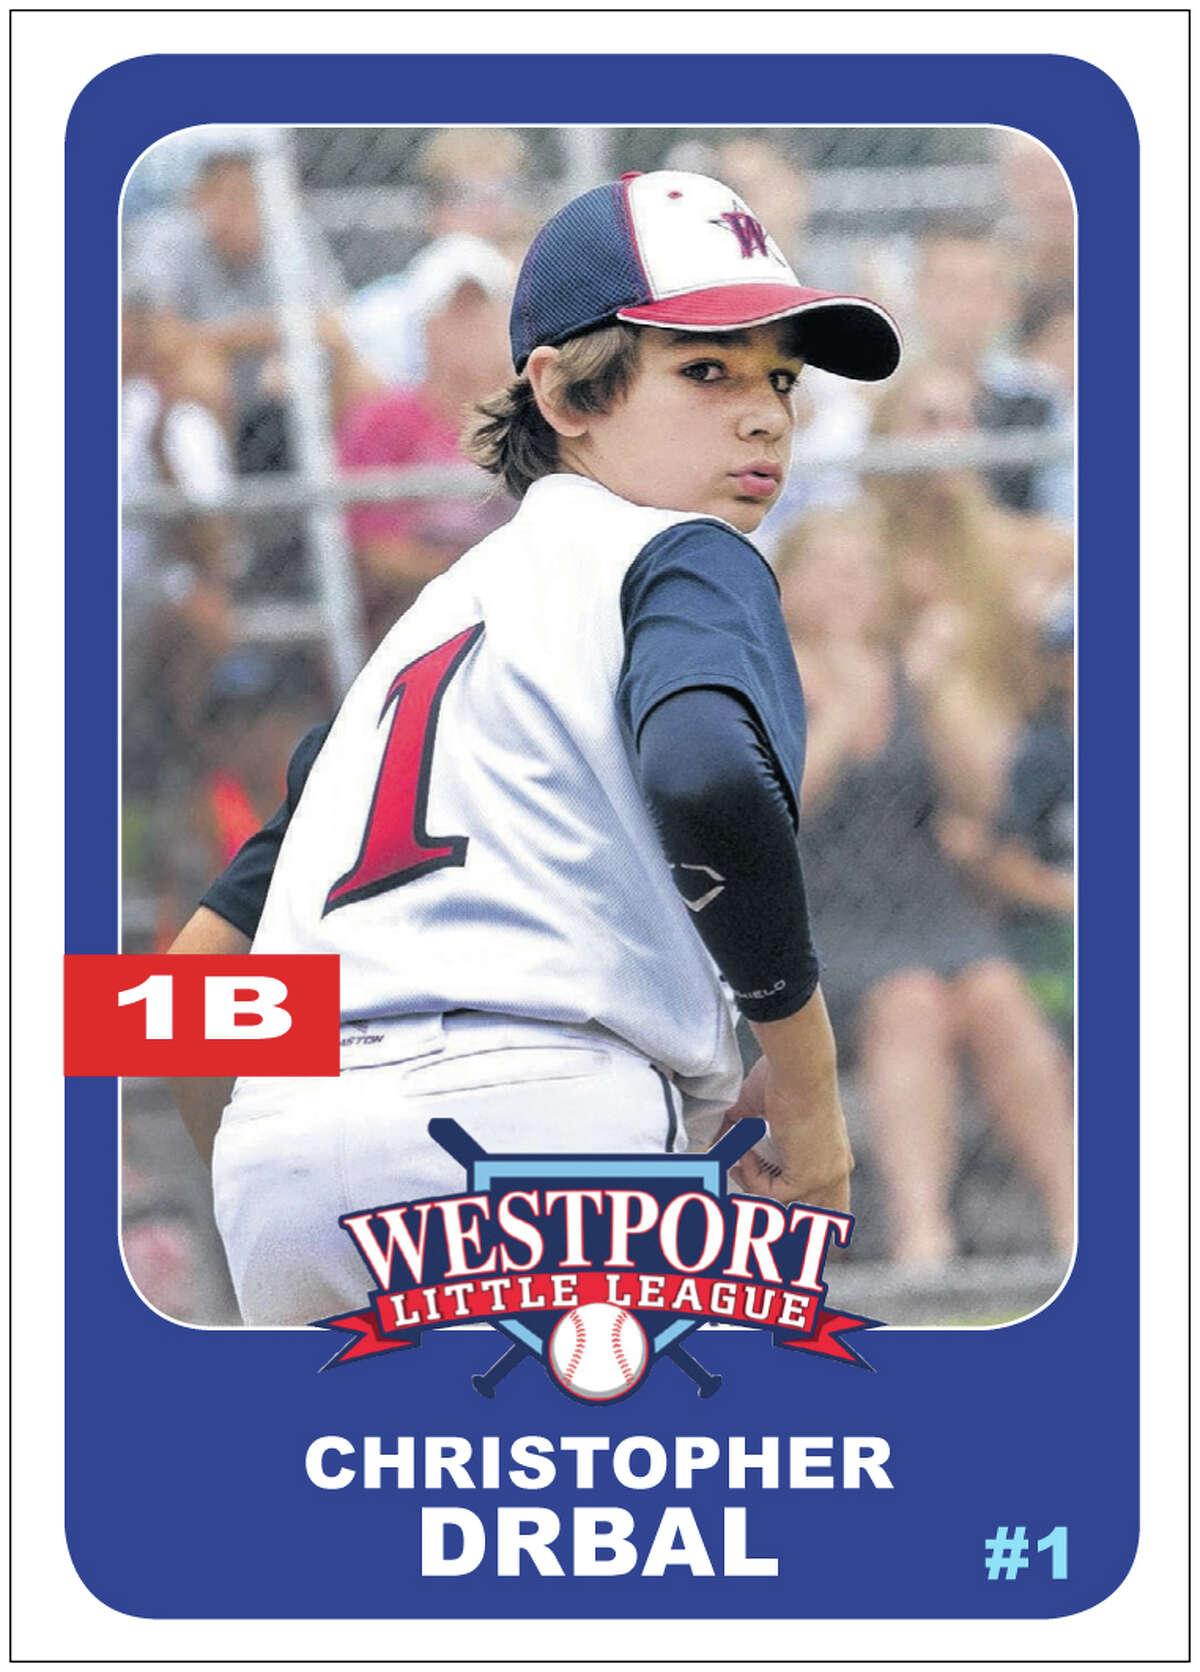 #1 CHRISTOPHER DRBAL Age: 13 Position: 1B Bats/Throws: R/R N.E. Tournament: .385 batting average, five runs scored, five hits